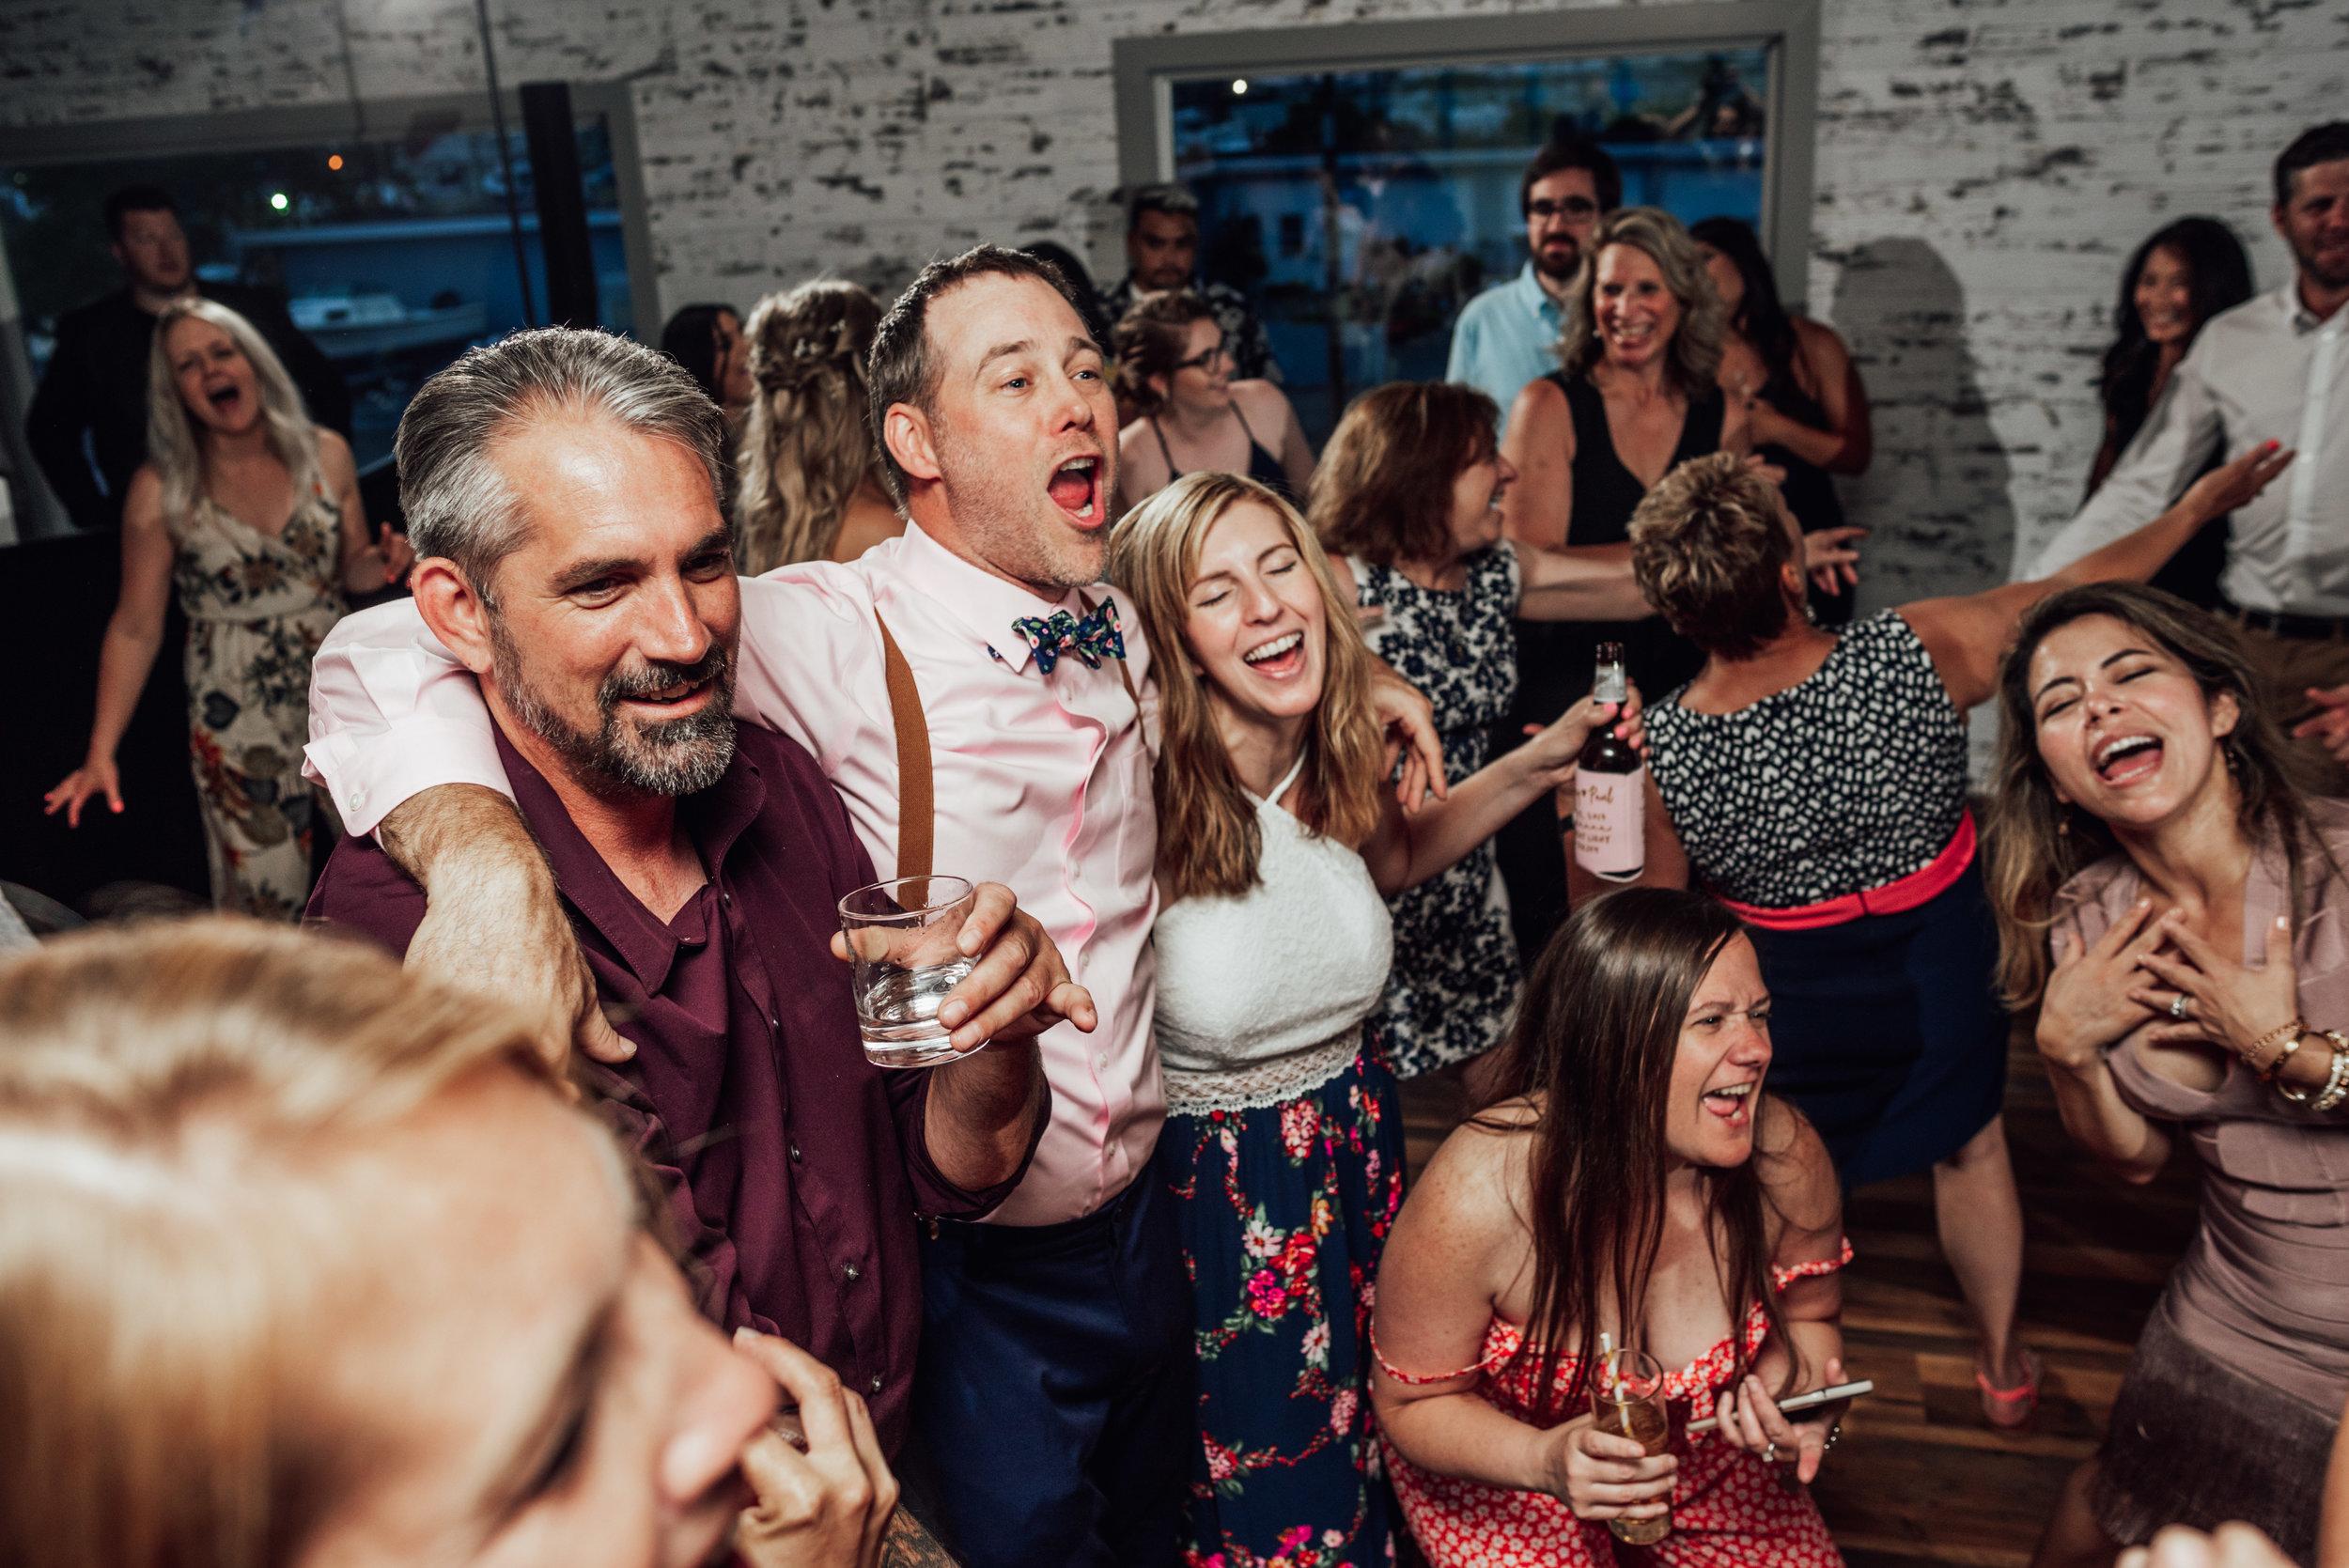 New Jersey Wedding Photographer, Felsberg Photography LBI wedding photography 117.jpg